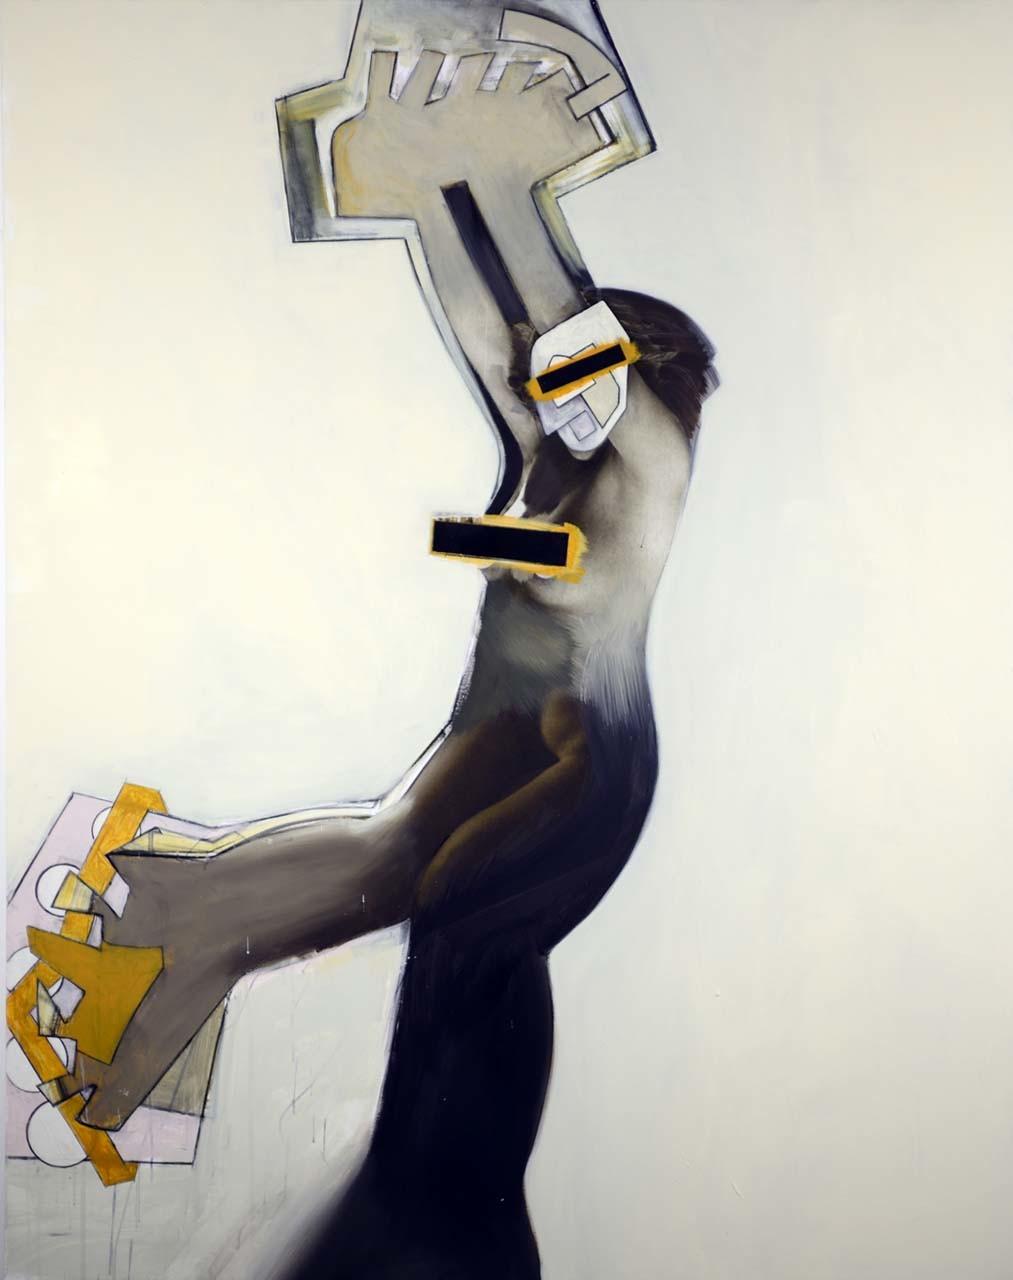 "<div class=""artwork_caption""><p>Untitled, 2012</p></div>"